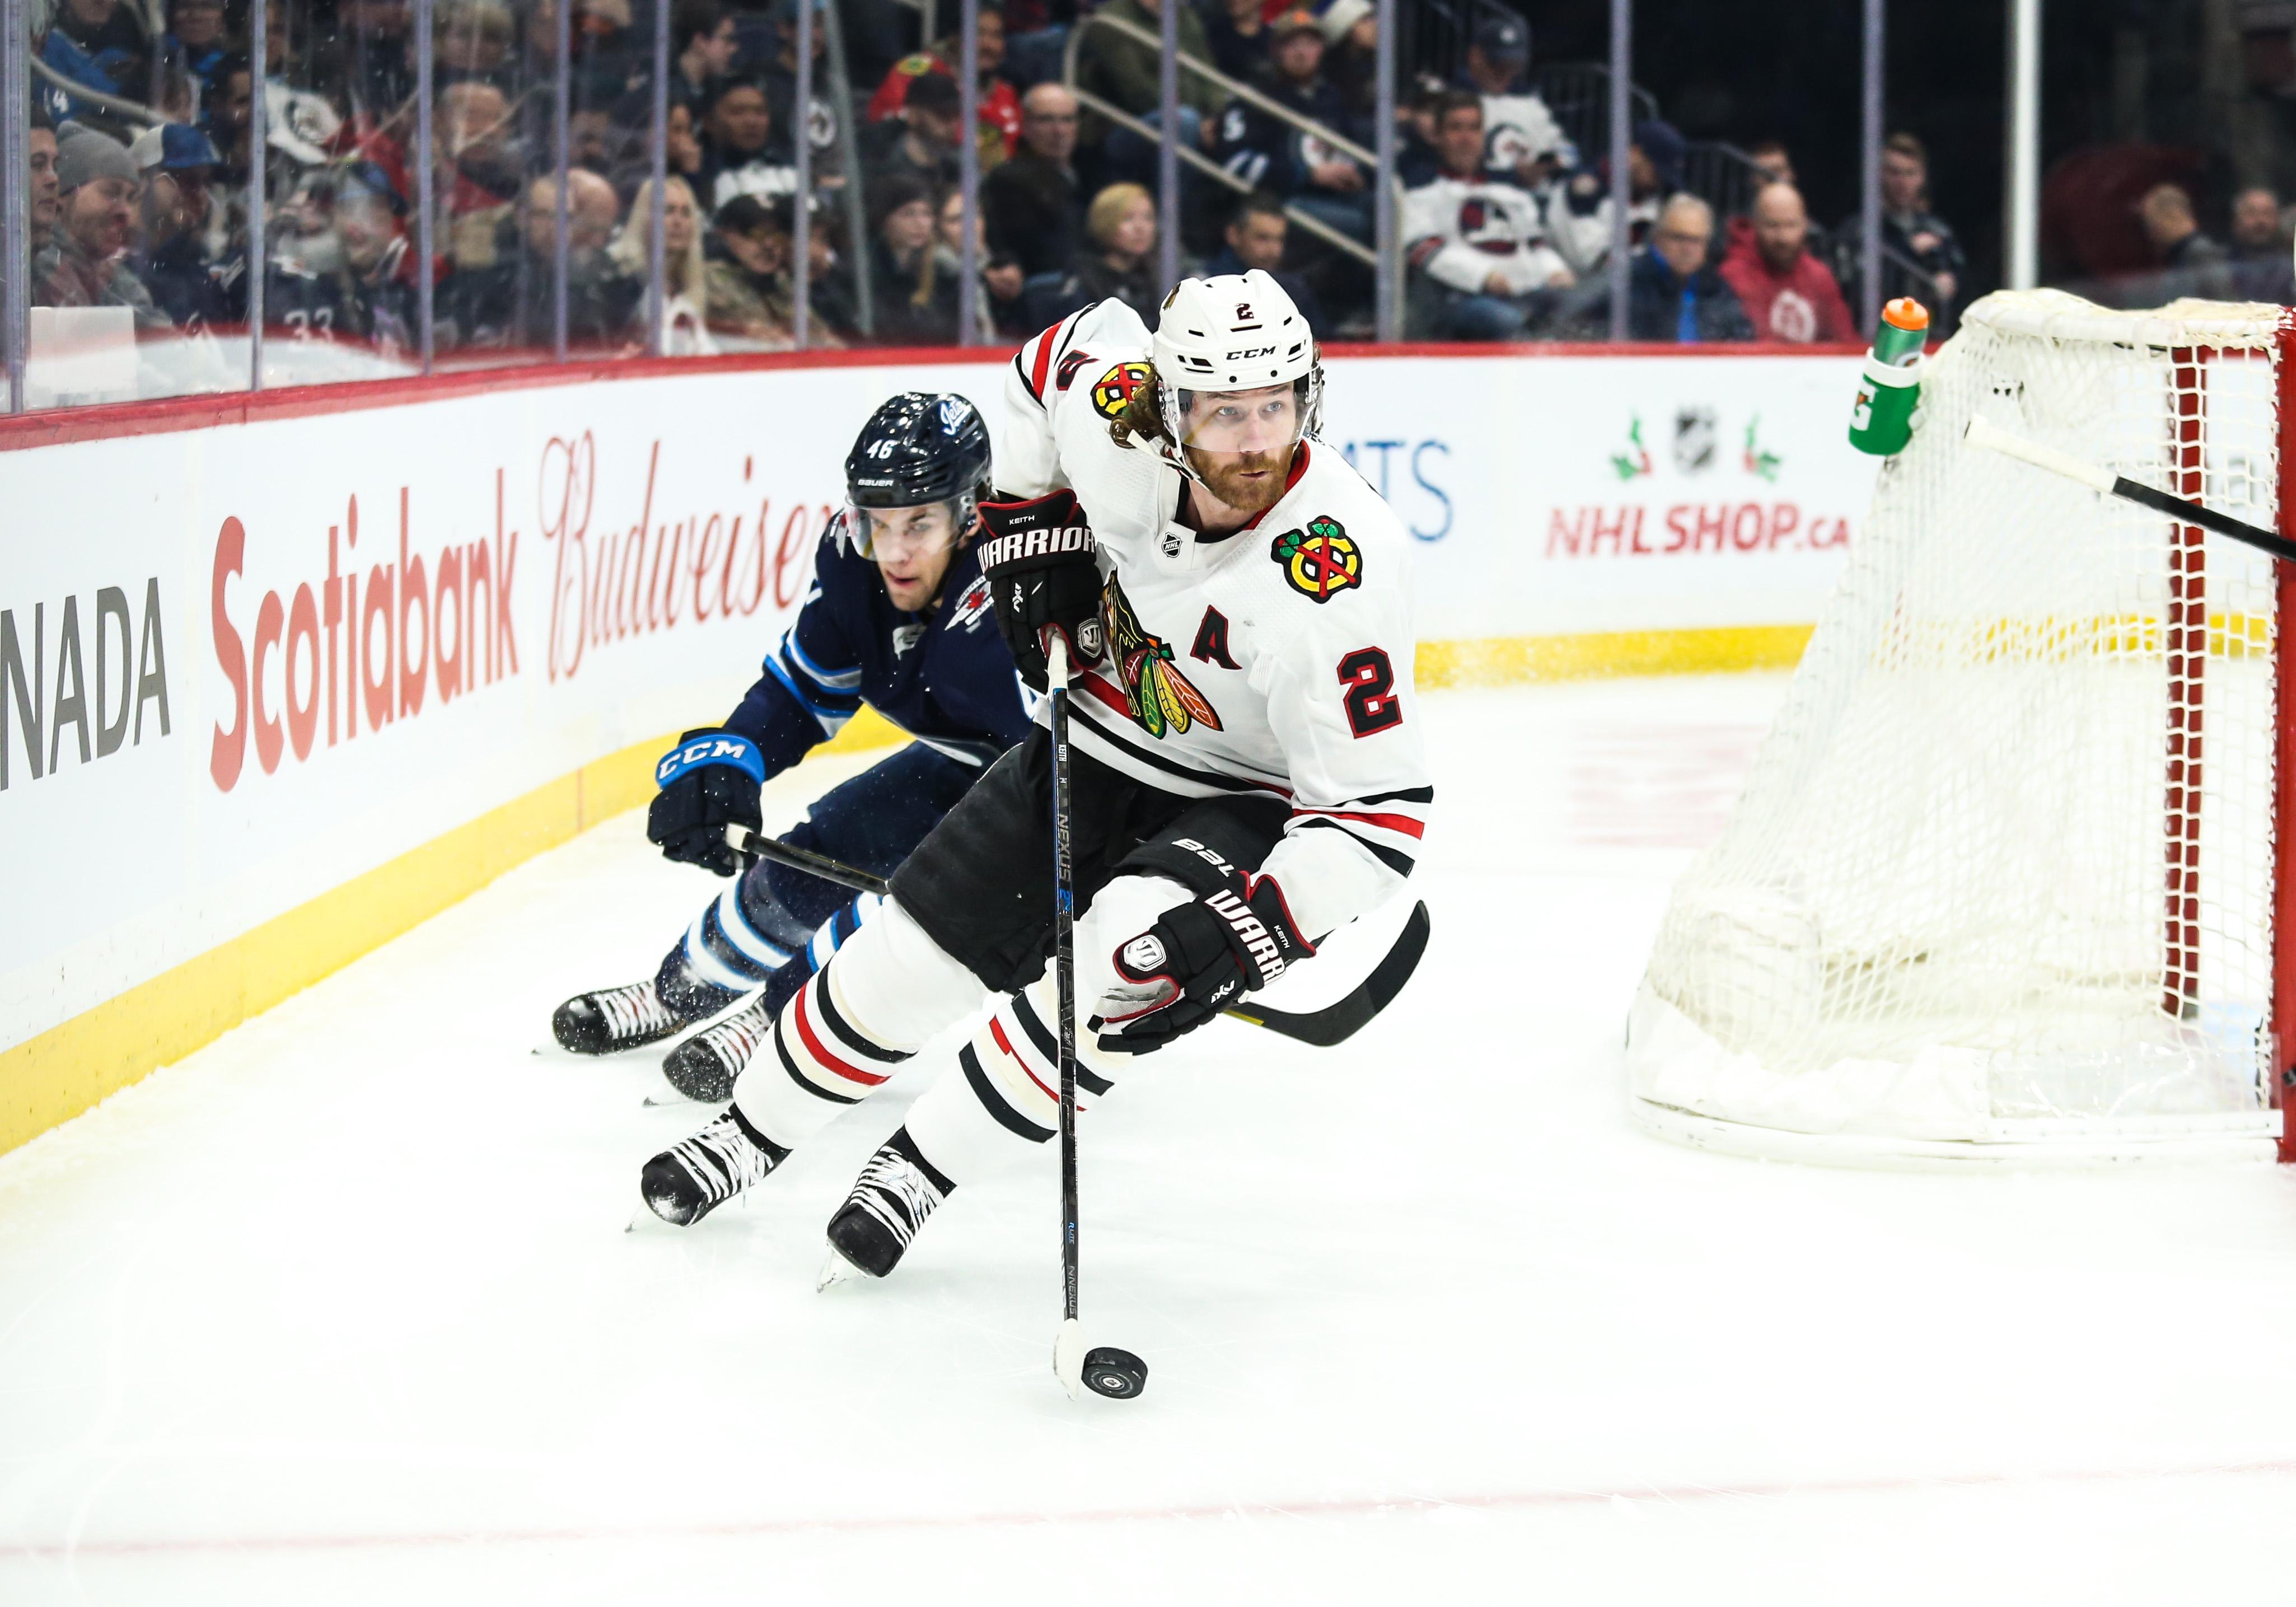 NHL: DEC 19 Blackhawks at Jets